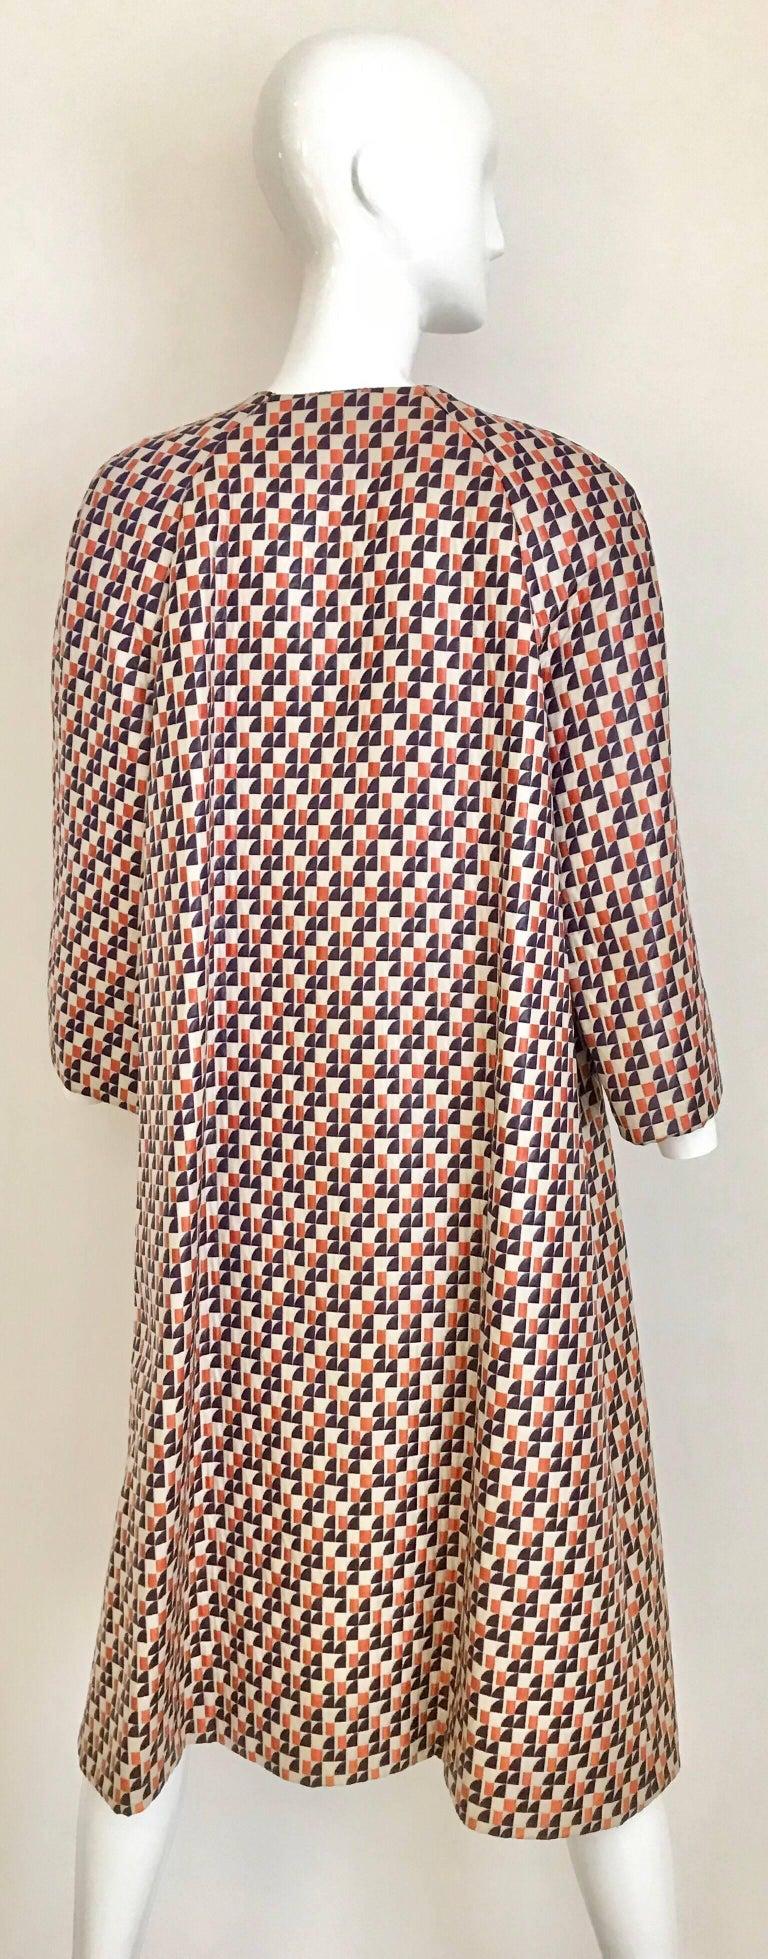 Women's 1960s Multi Color Checkered Print Coat For Sale